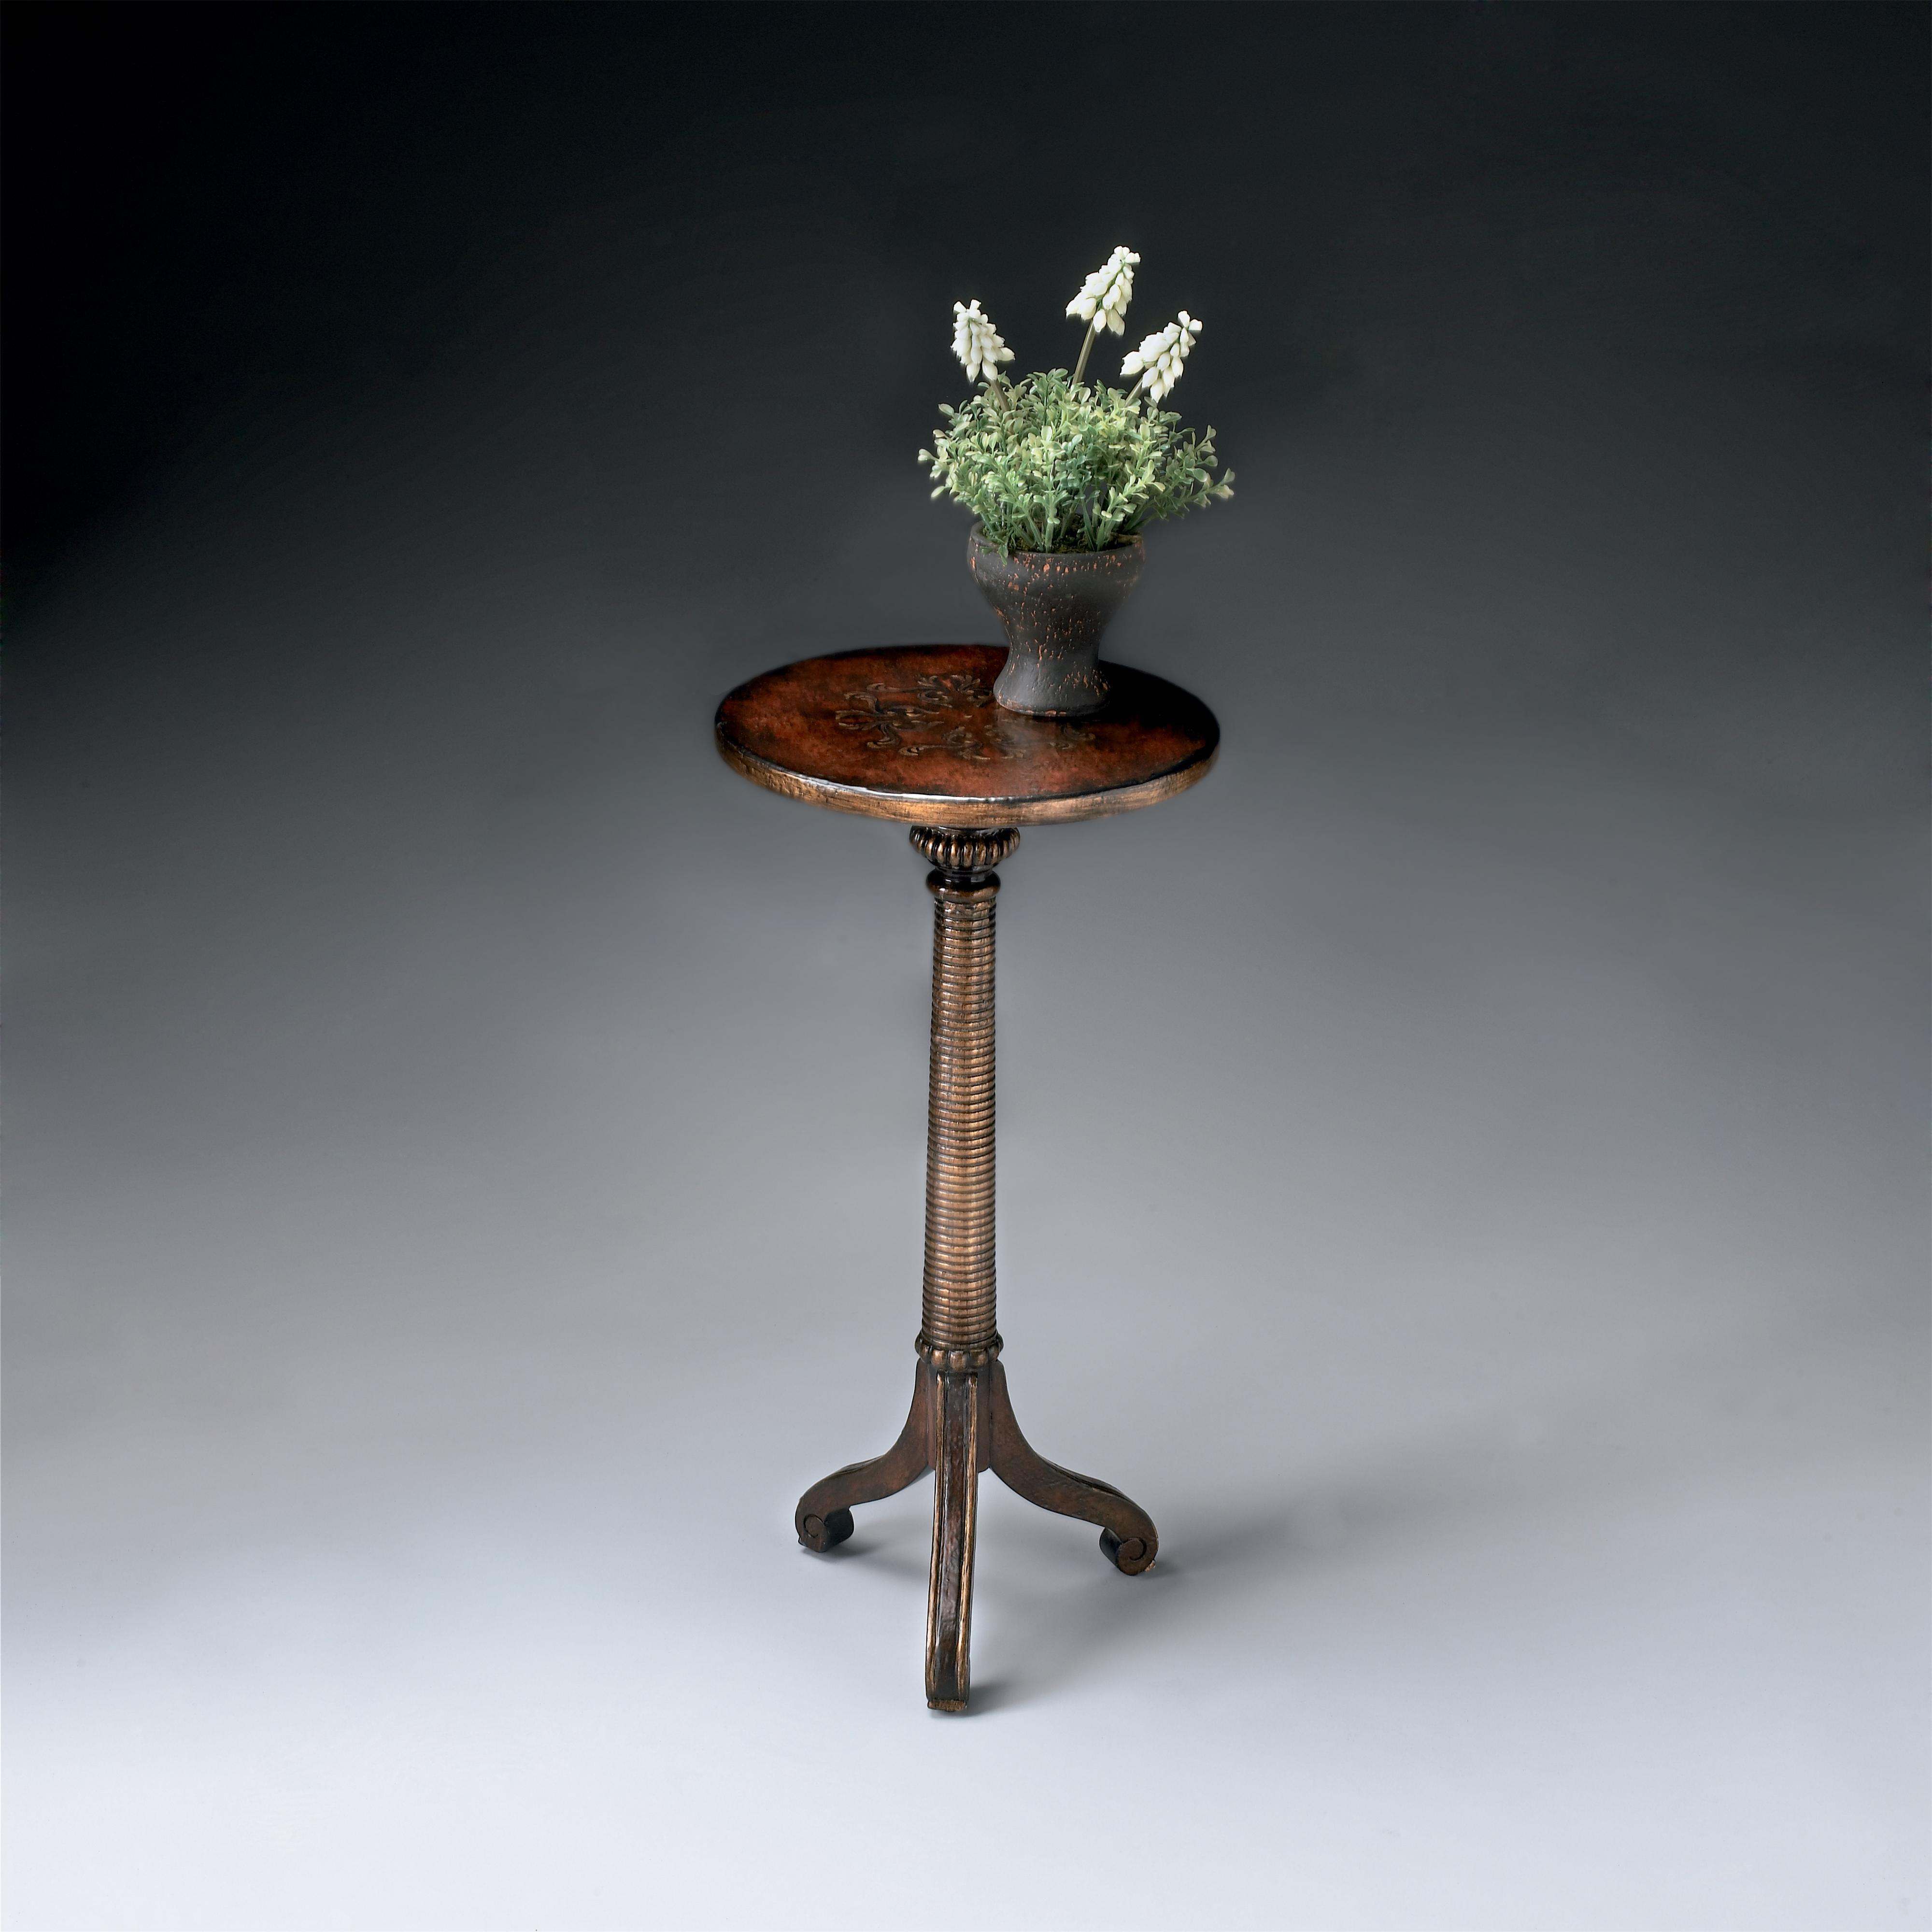 Butler Specialty Company Artist's Originals Pedestal Table - Item Number: 1583119